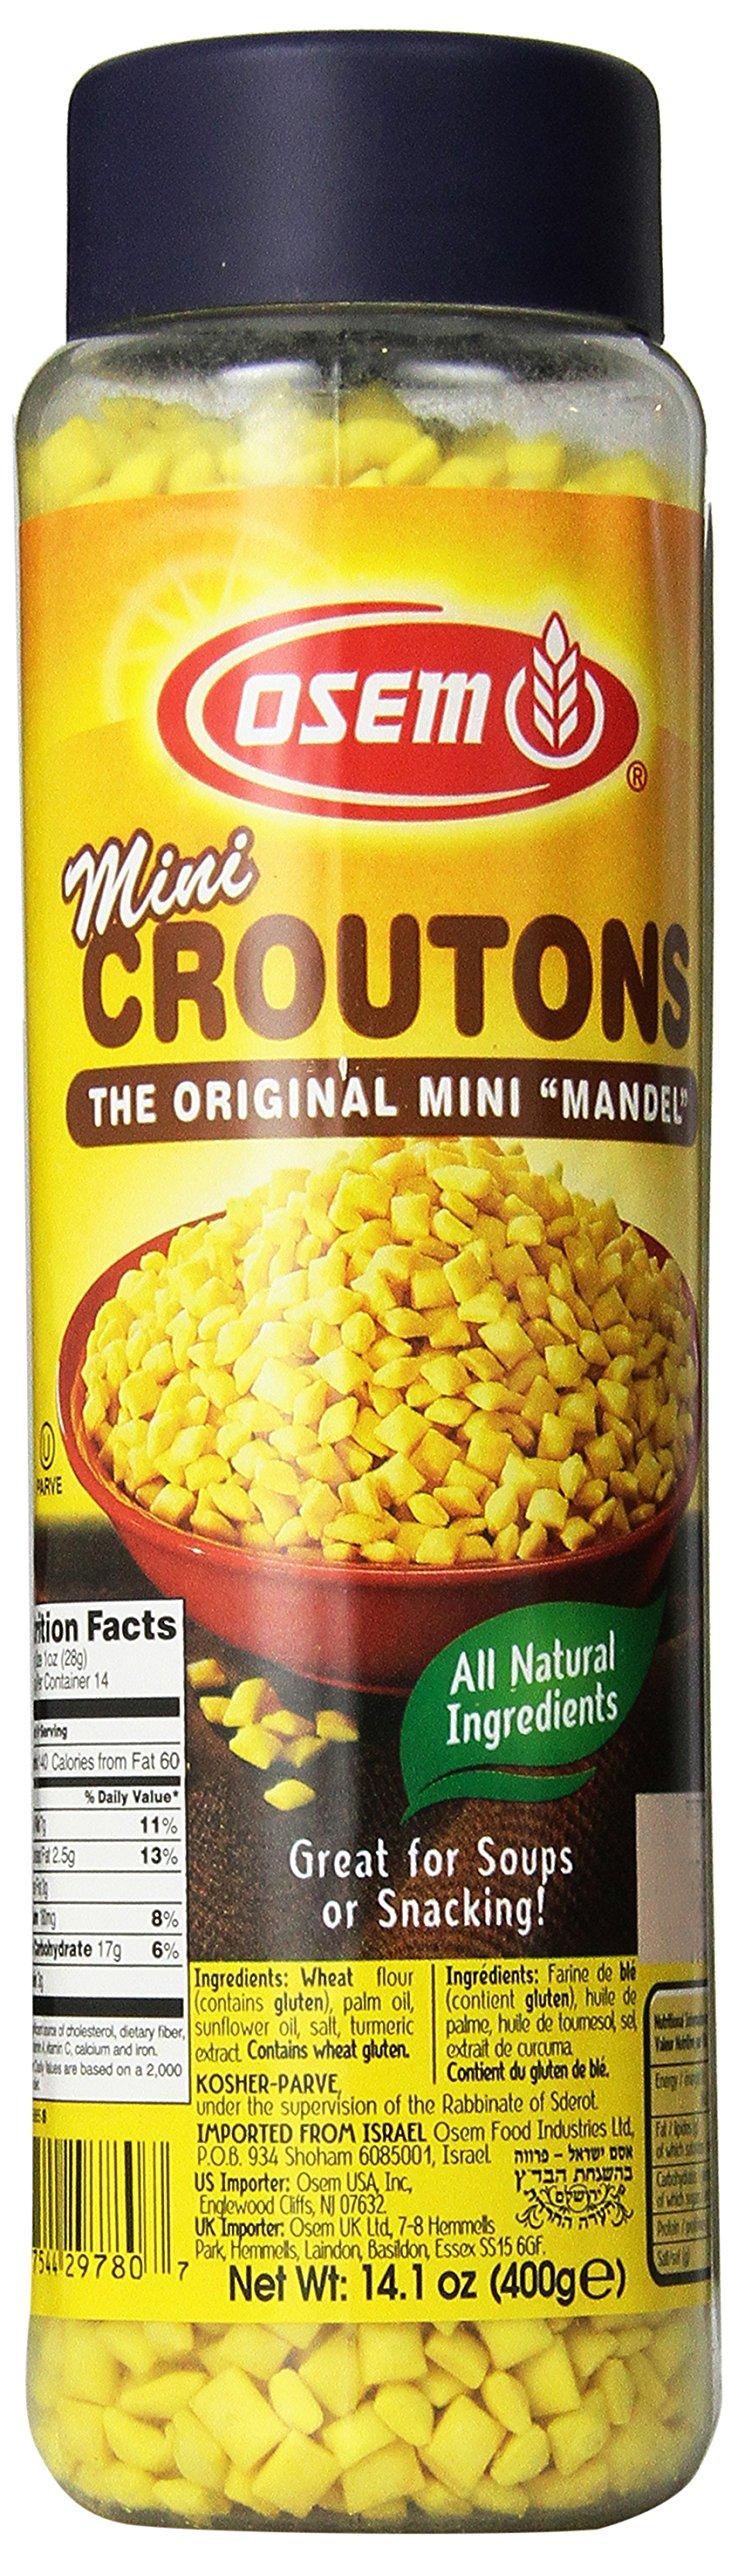 The Original Soup Croutons By Osem Mini Mandel Soup Almonds (Pack of 12)